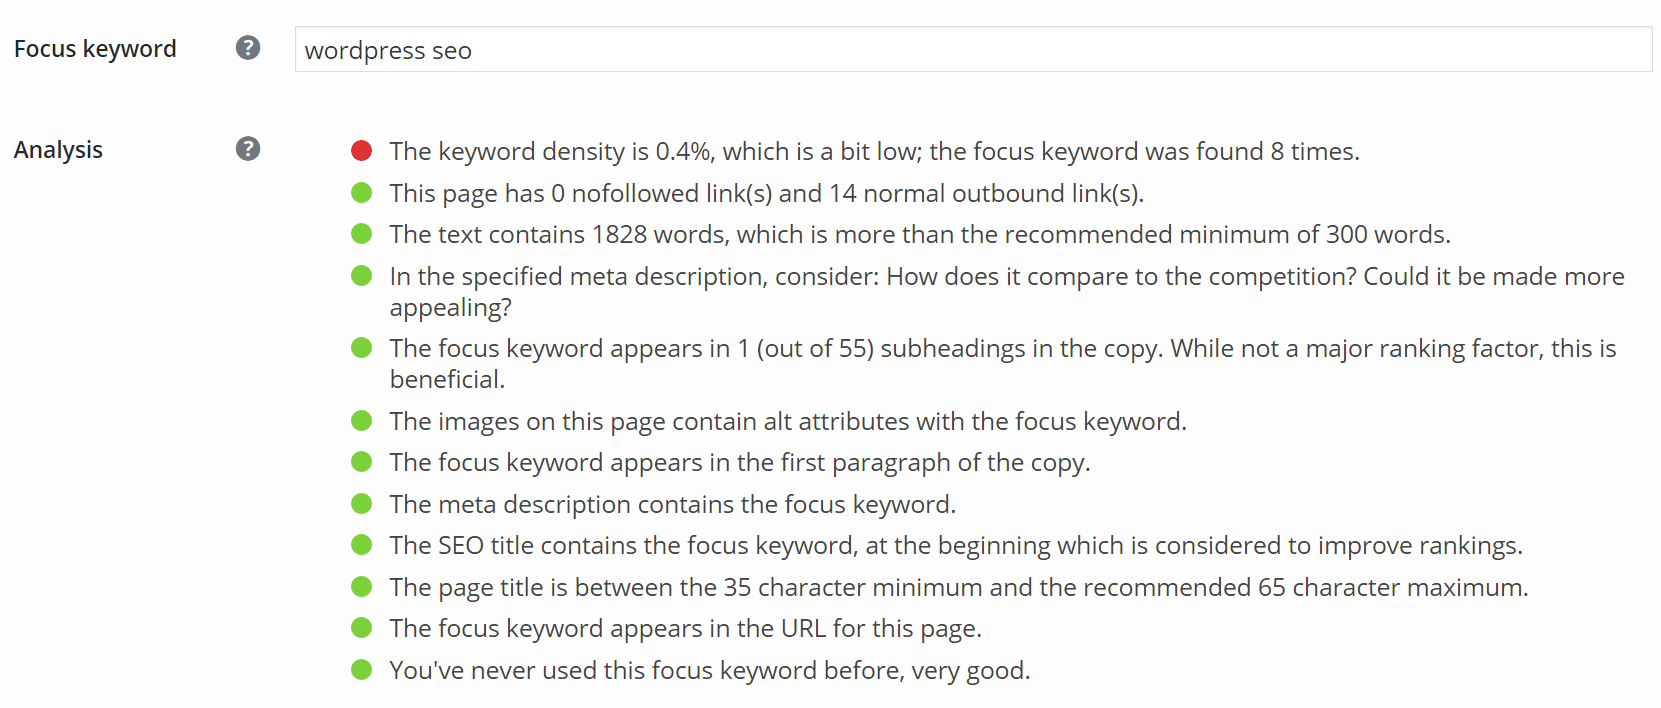 WordPress SEO focus keyword